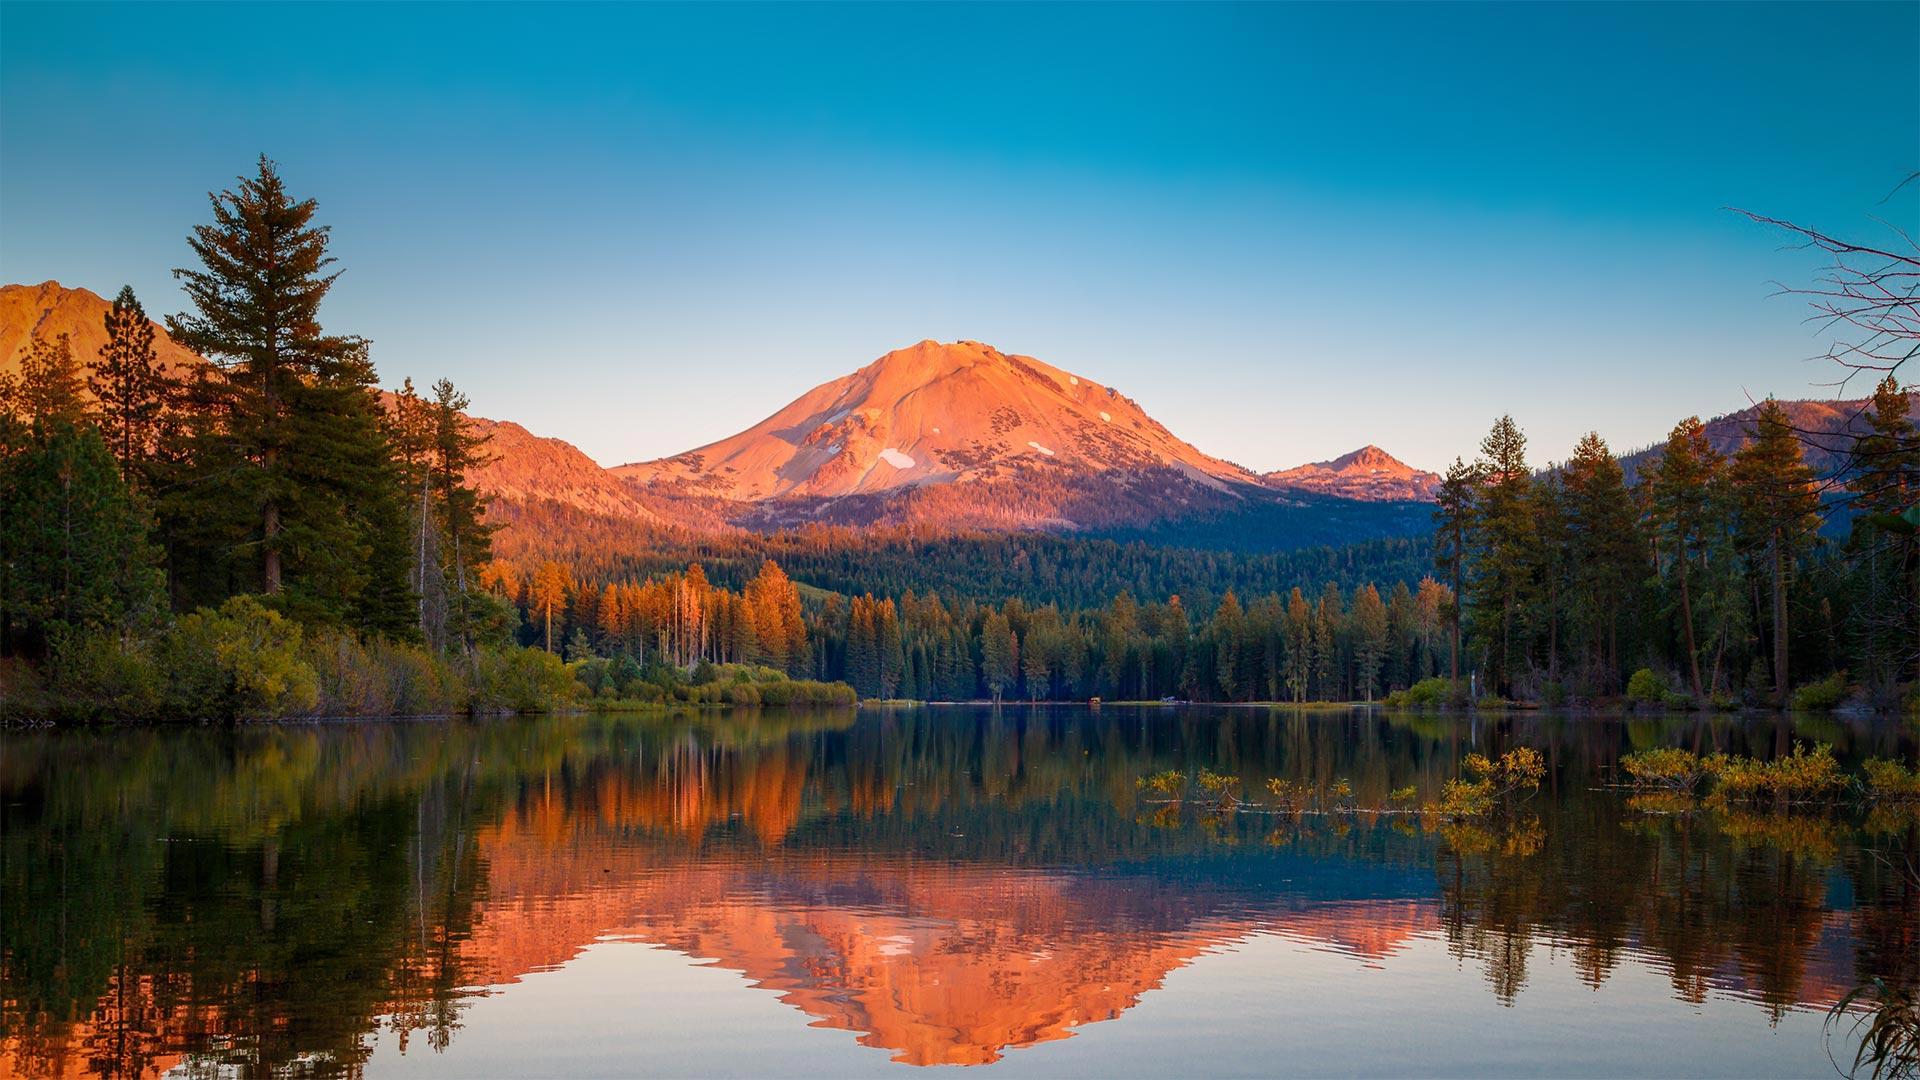 Lassen Peak in Lassen Volcanic National Park, California (© Engel Ching/Shutterstock)(Bing United States)